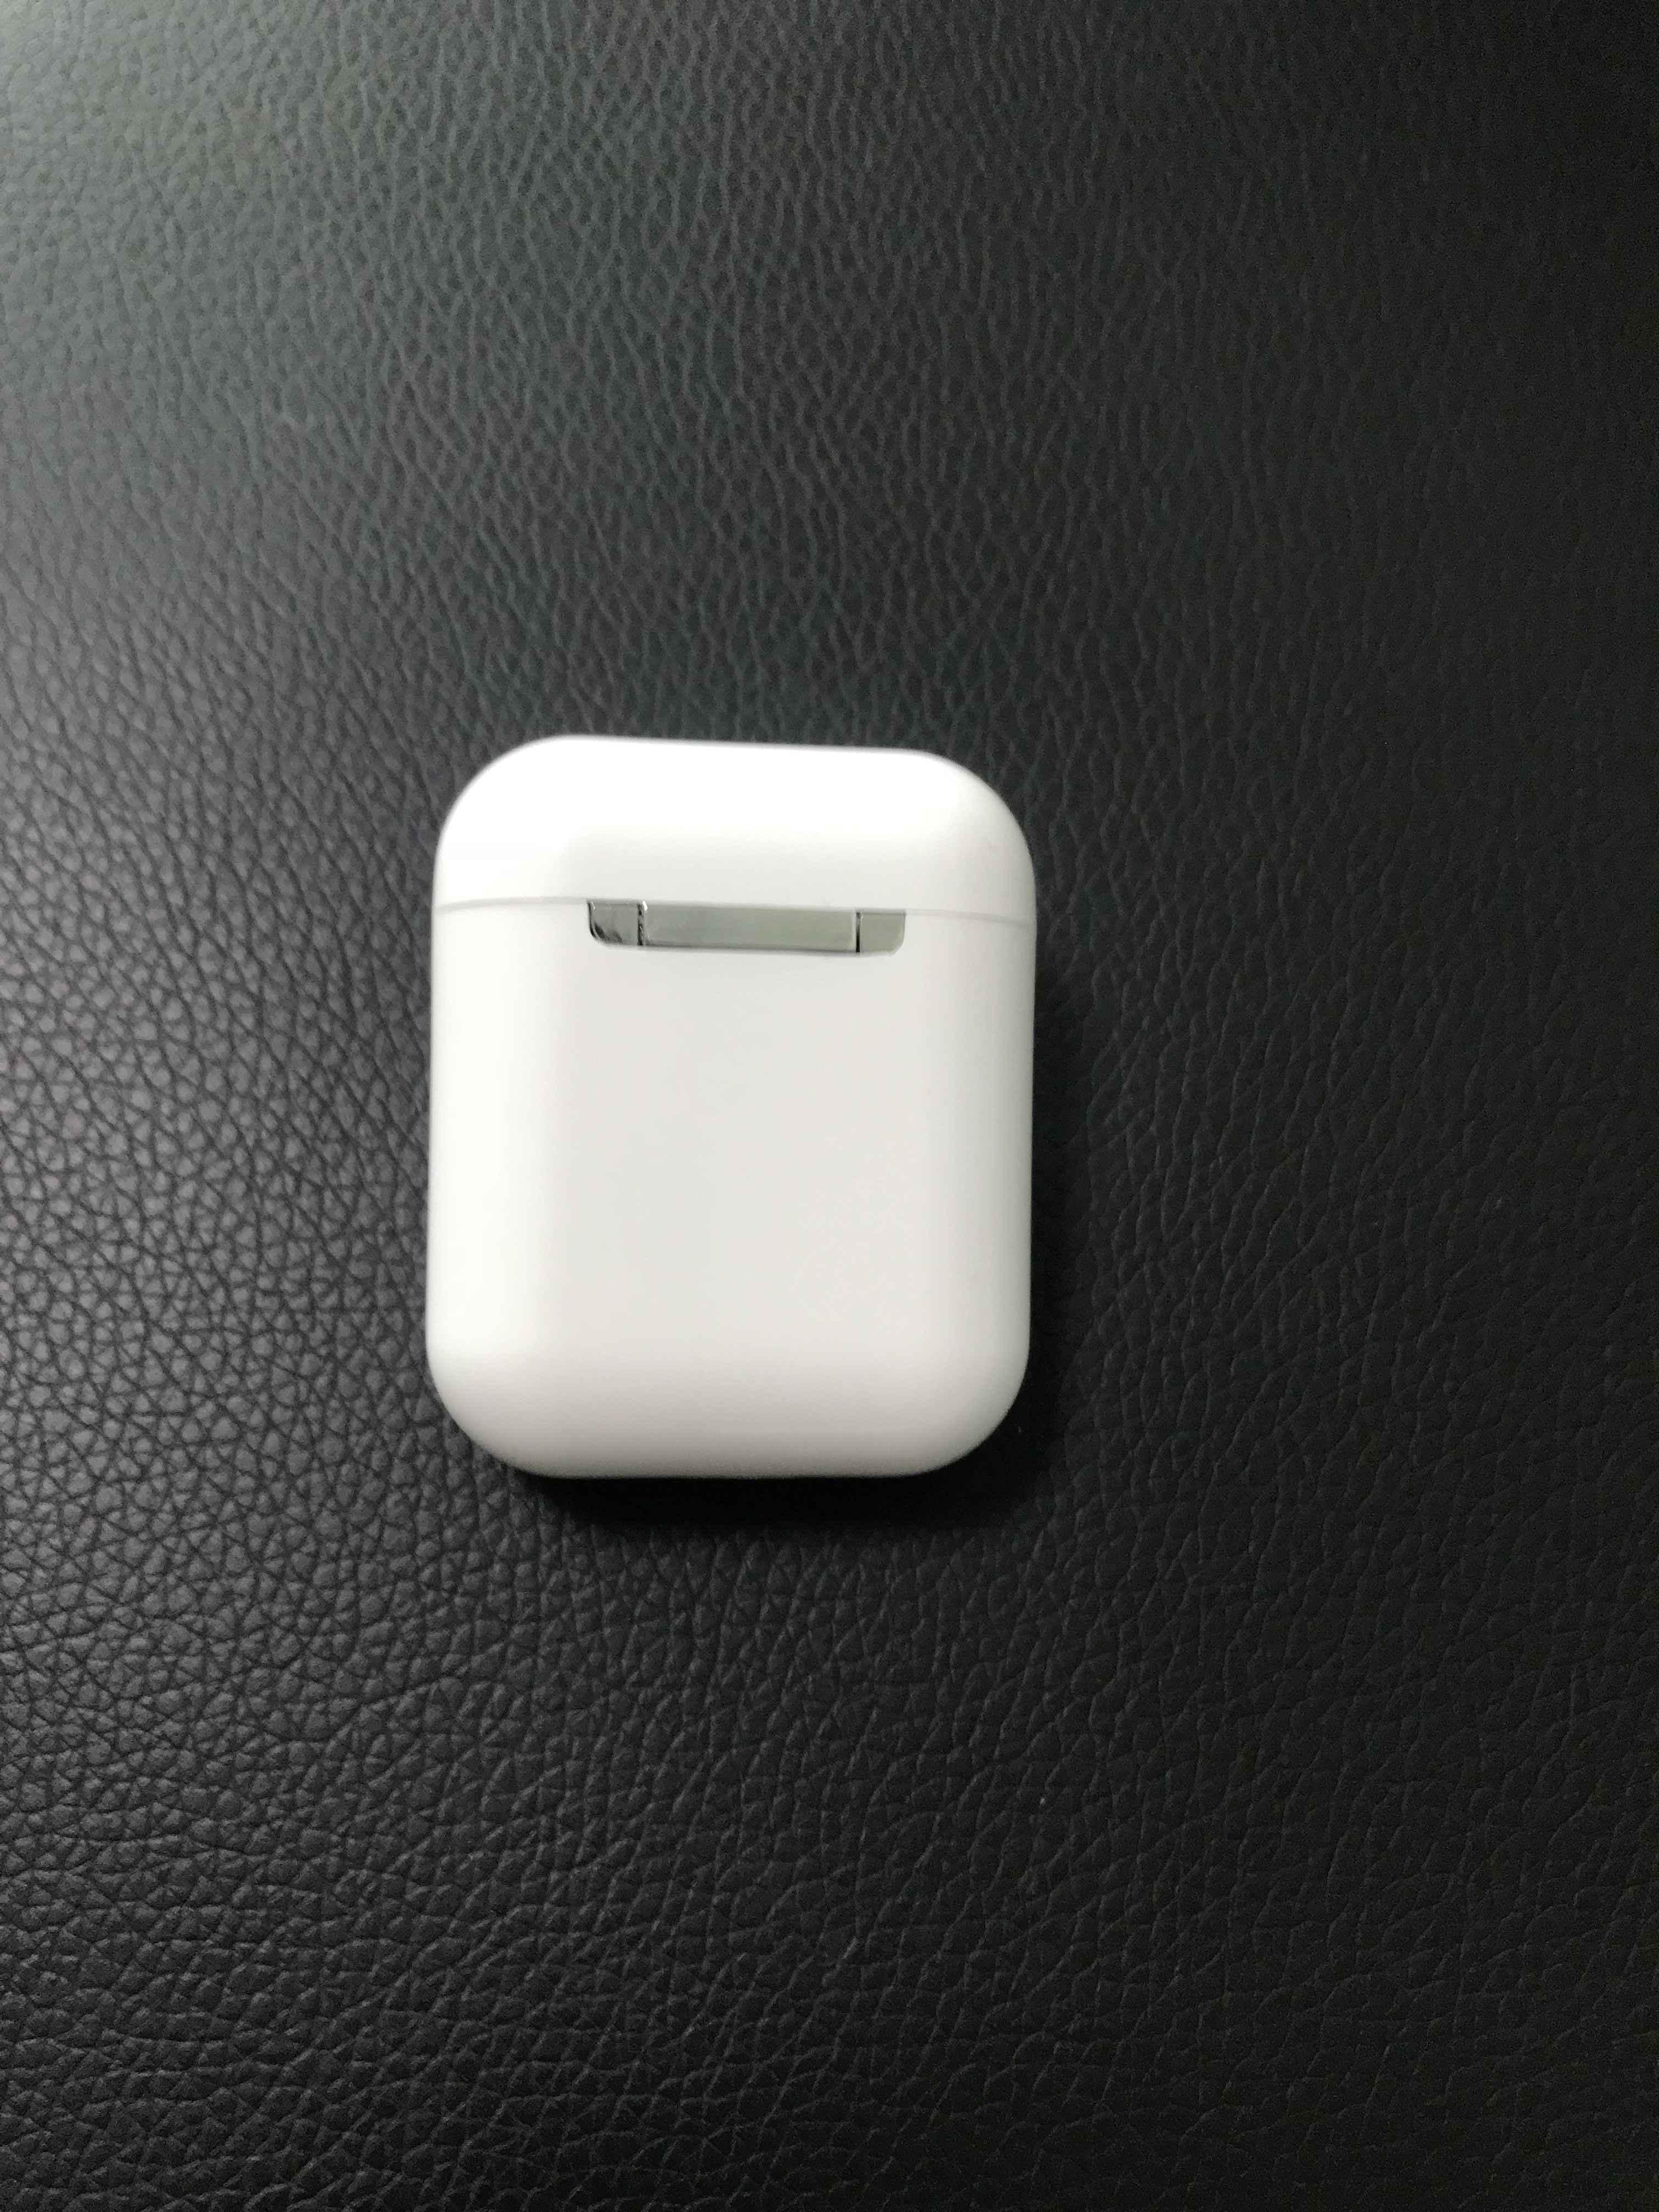 Orijinal 1:1 i10 tws i10s tws kablosuz Bluetooth kulaklık kulaklık 5.0 spor kulaklıklar pk i12 i80 i20 i30 TWS tüm akıllı telefonlar